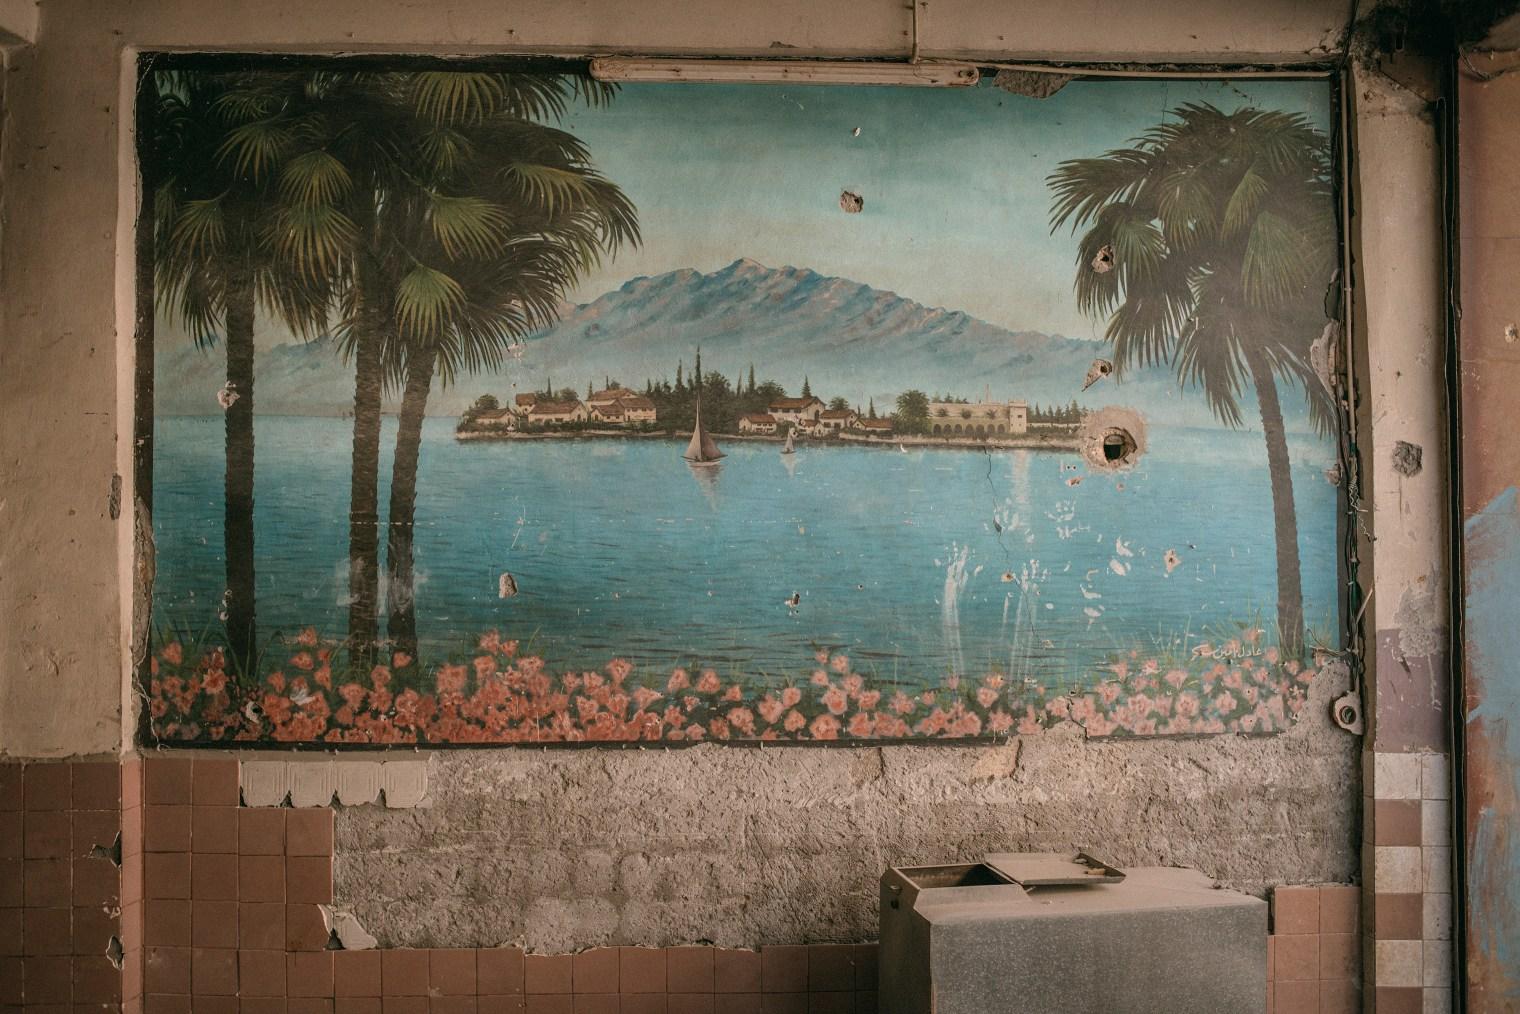 emanuele-satolli-raqqa-syria-reconstruction-chemistry-mural